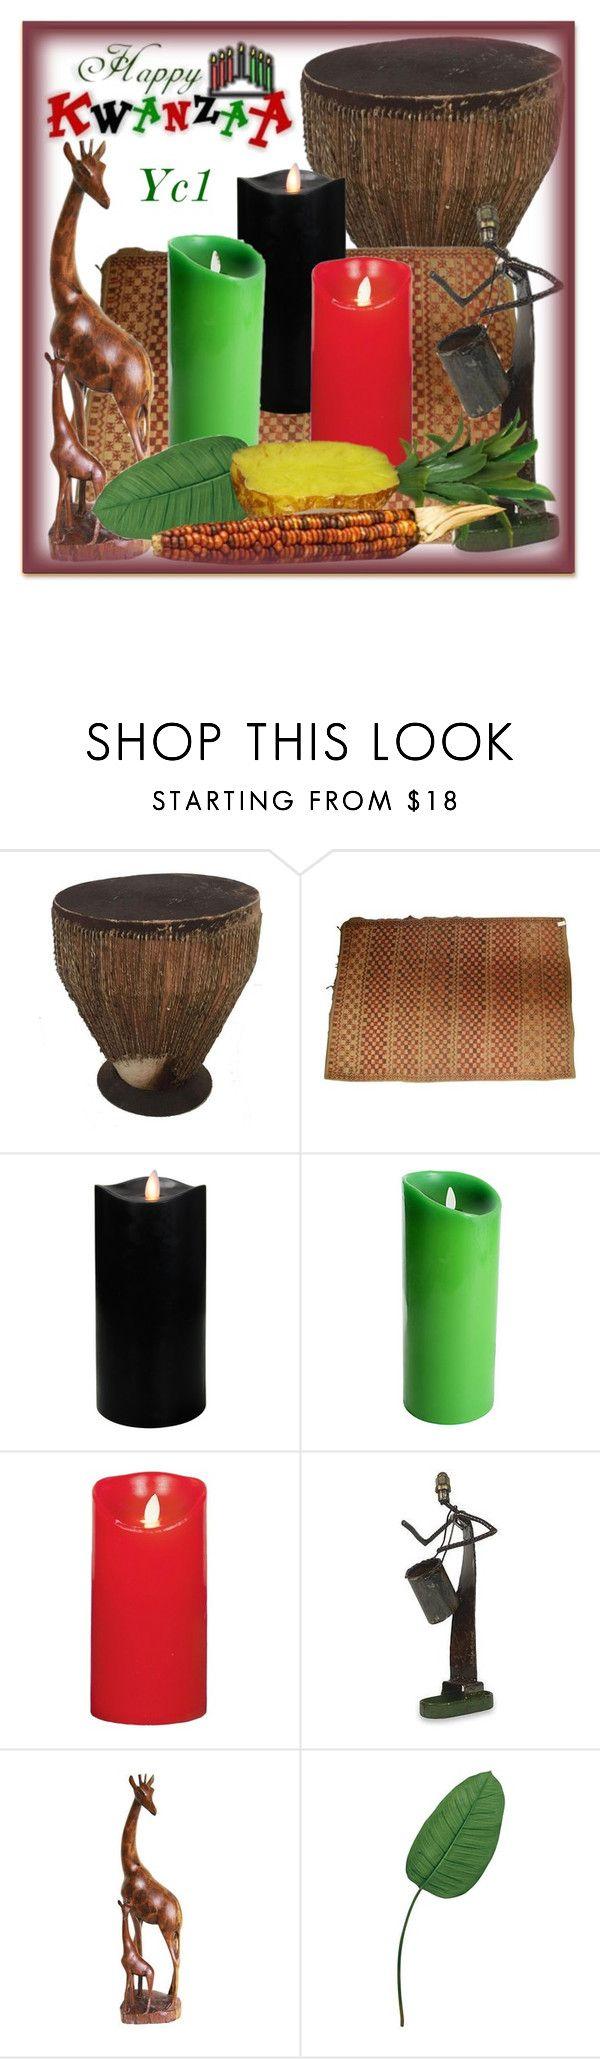 """Habari Gani?-Kwanzaa"" by yc1love ❤ liked on Polyvore featuring interior, interiors, interior design, home, home decor, interior decorating, Boston Warehouse, Luminara, NOVICA and Laura Cole"